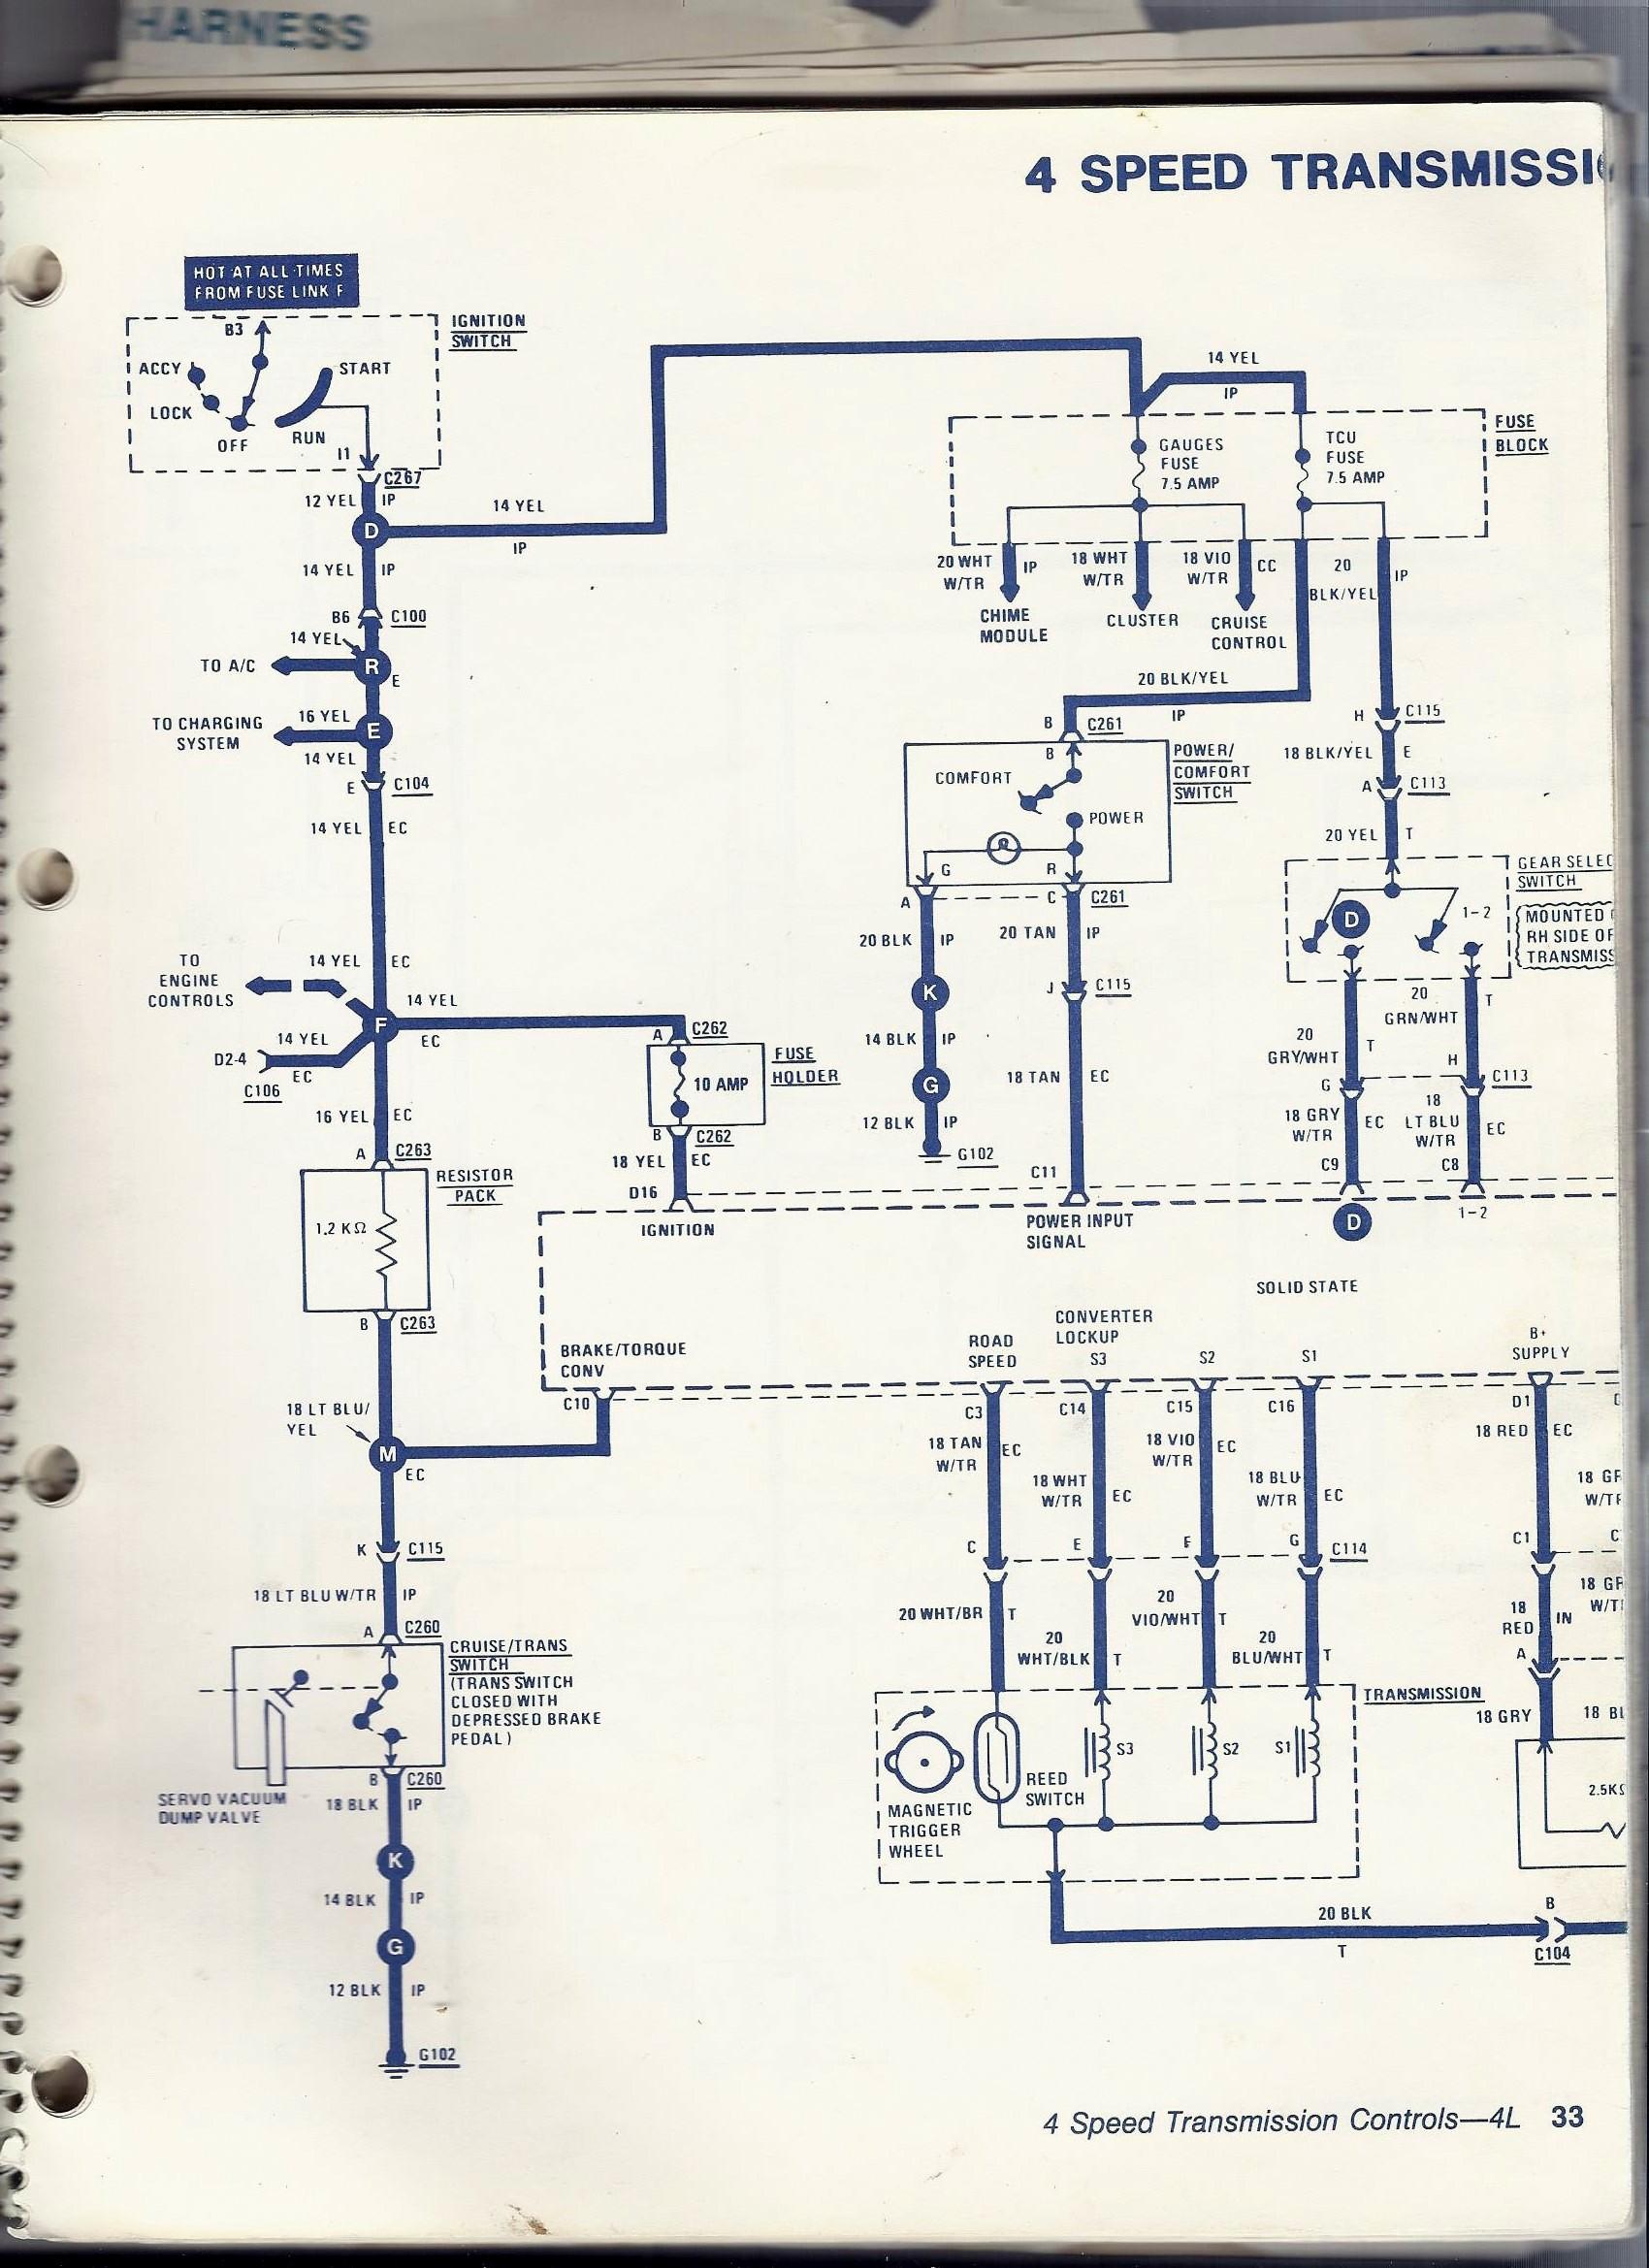 302231d1497829972 aw4 wiring diagram tcc wiring fsm?resize\=665%2C915\&ssl\=1 wiring daikin diagram dm96ve conventional fire alarm wiring diagram  at eliteediting.co